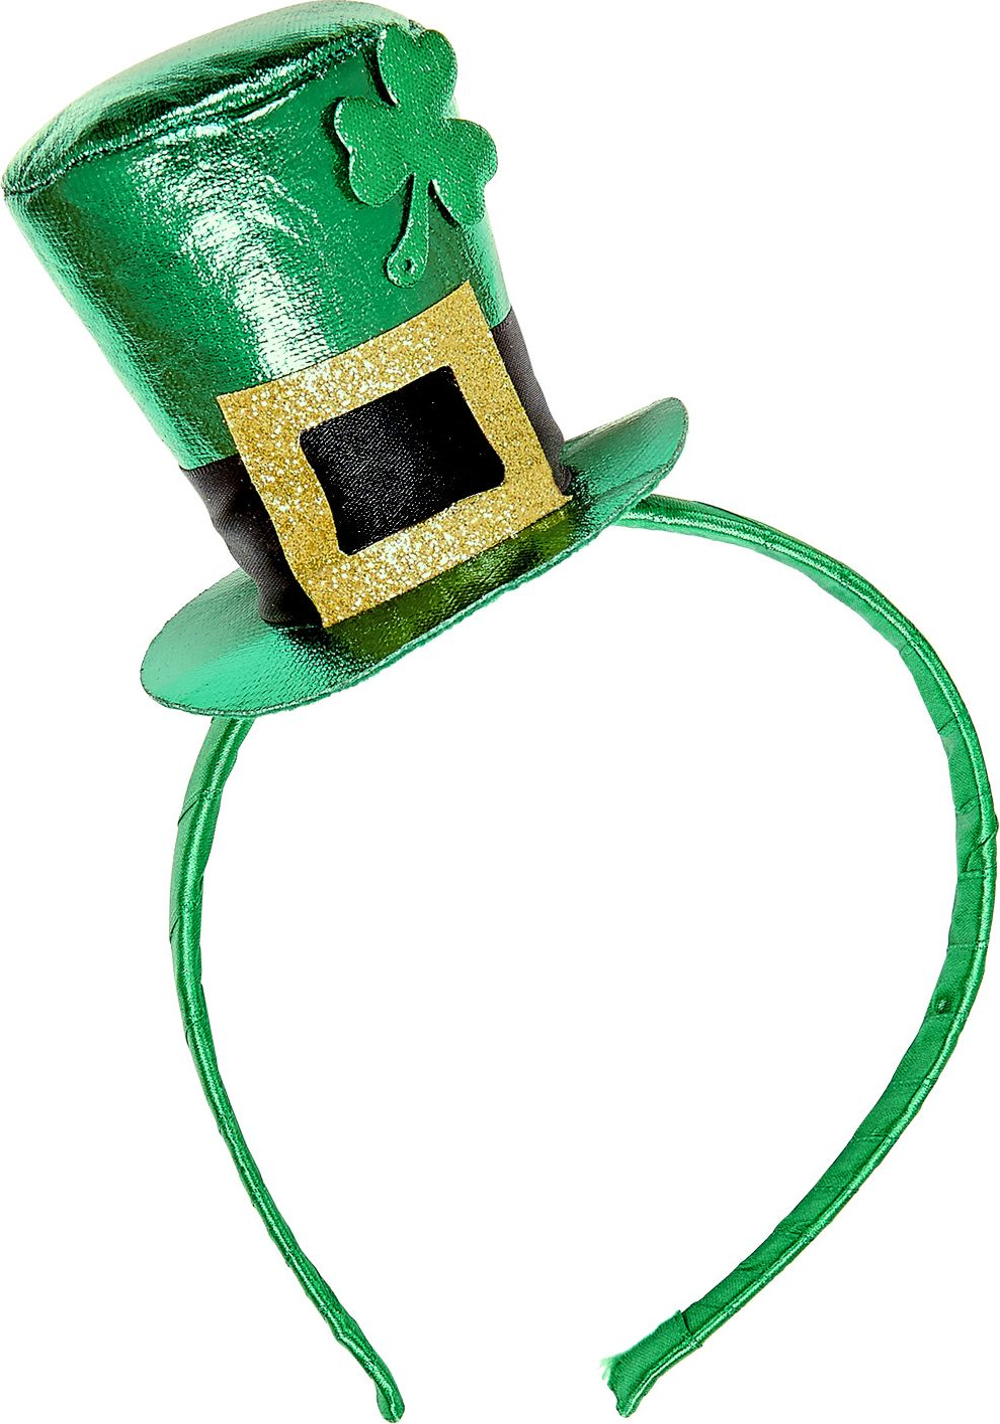 Hoofdband met St. Patricksday mini hoedje